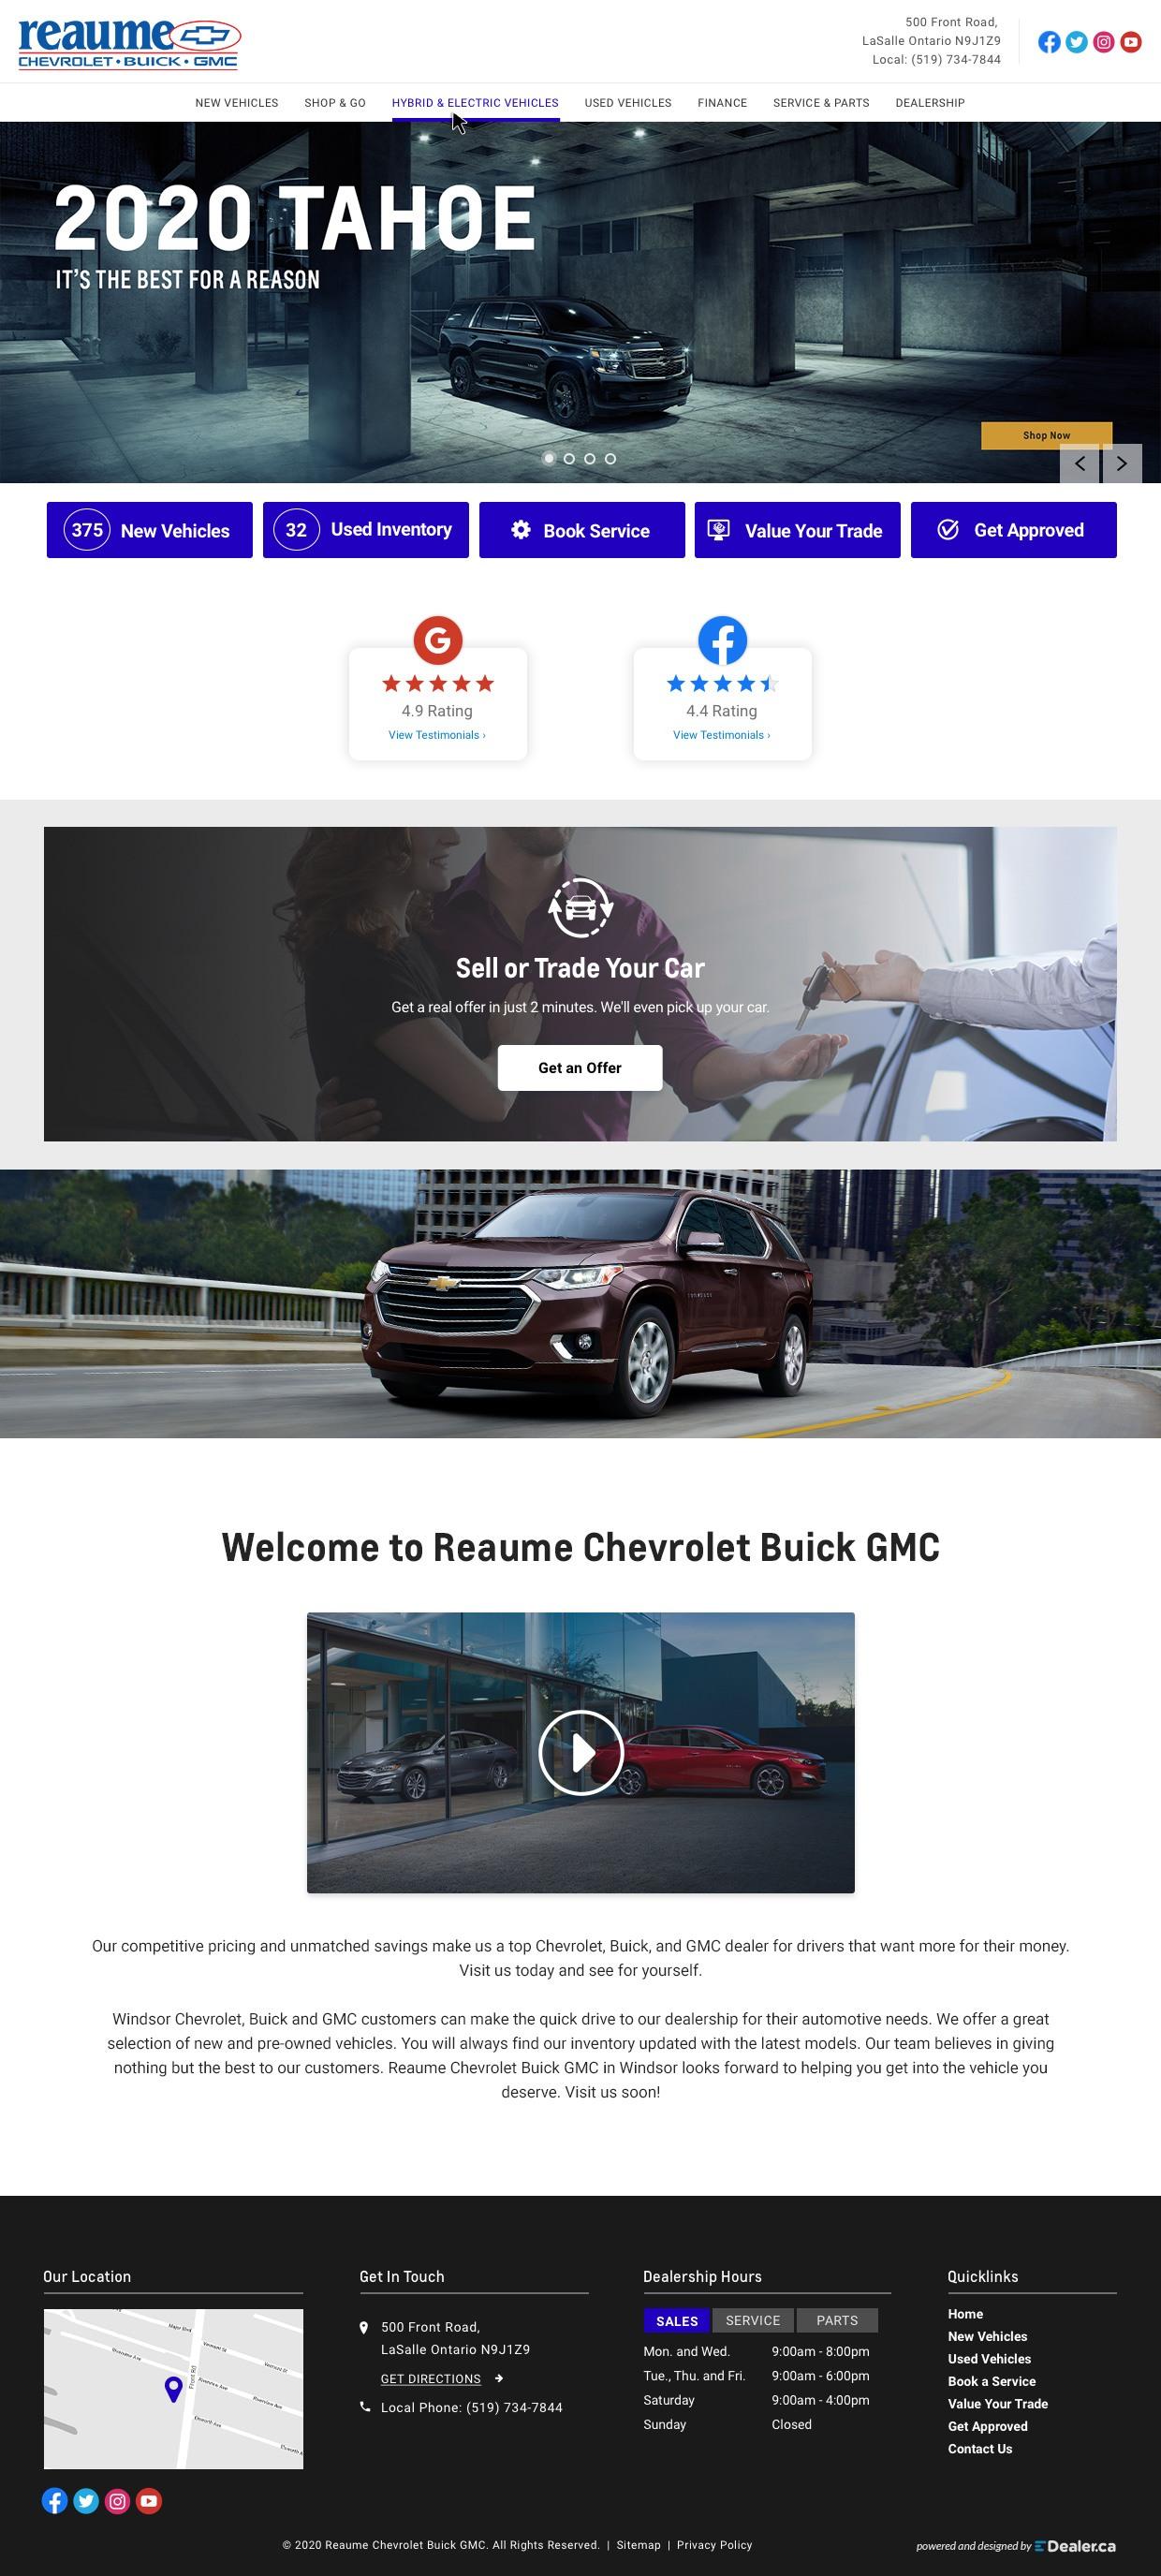 Reaume Chevrolet Buick GMC